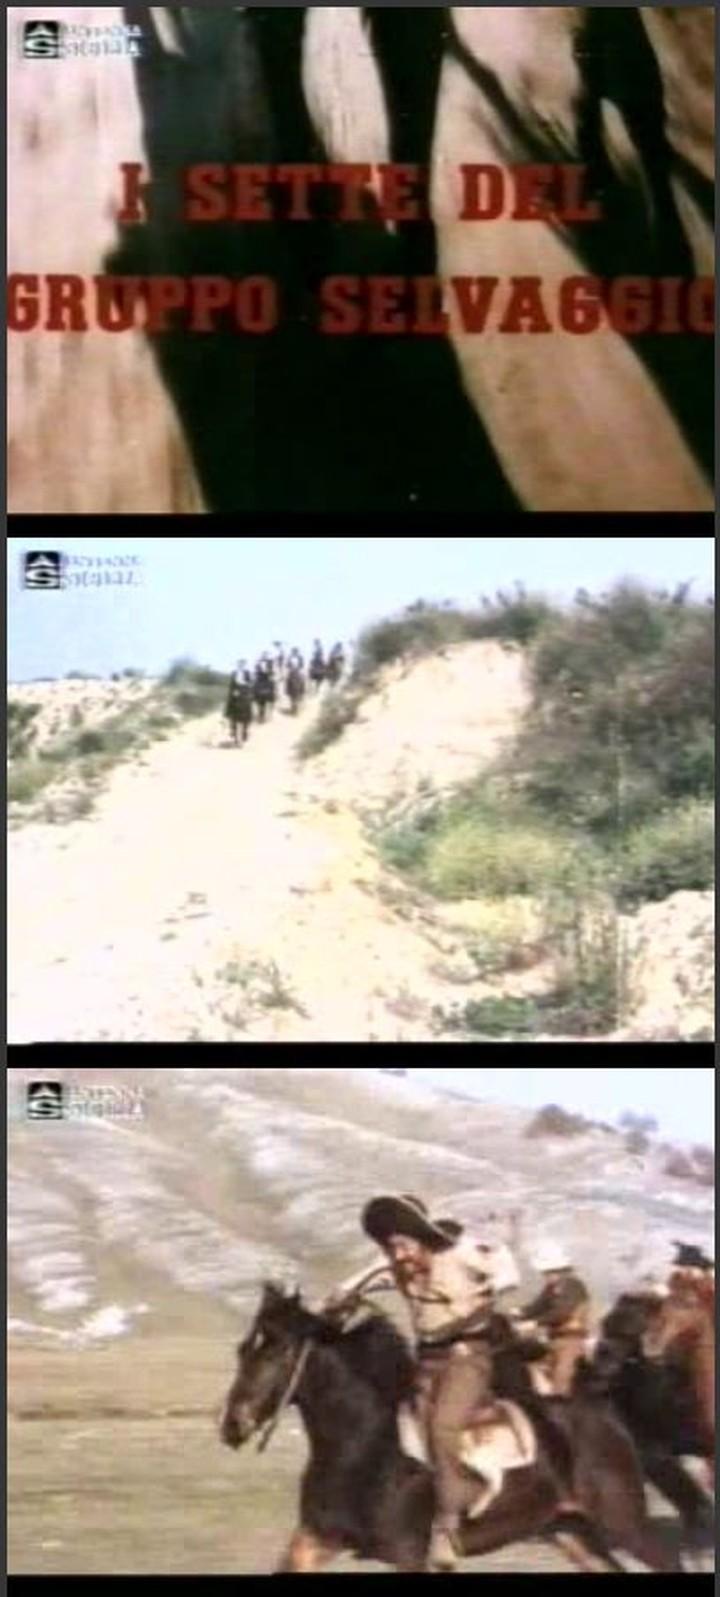 I sette del gruppo selvaggio (Inédit en France) - 1972 ou 1975 - Gianni Crea - Captur17